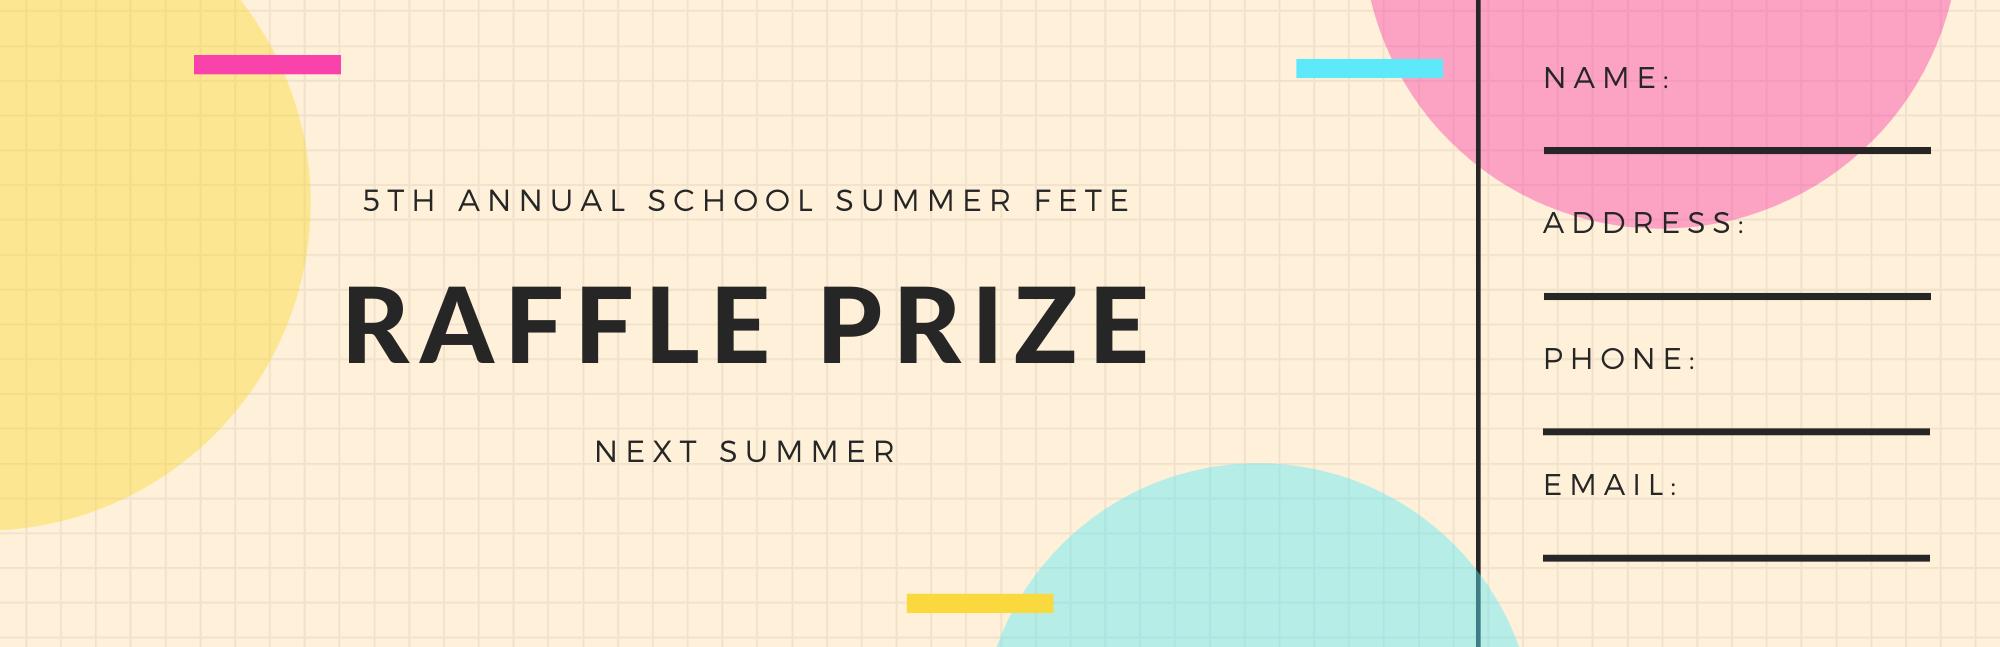 Mock Raffle Prize ticket